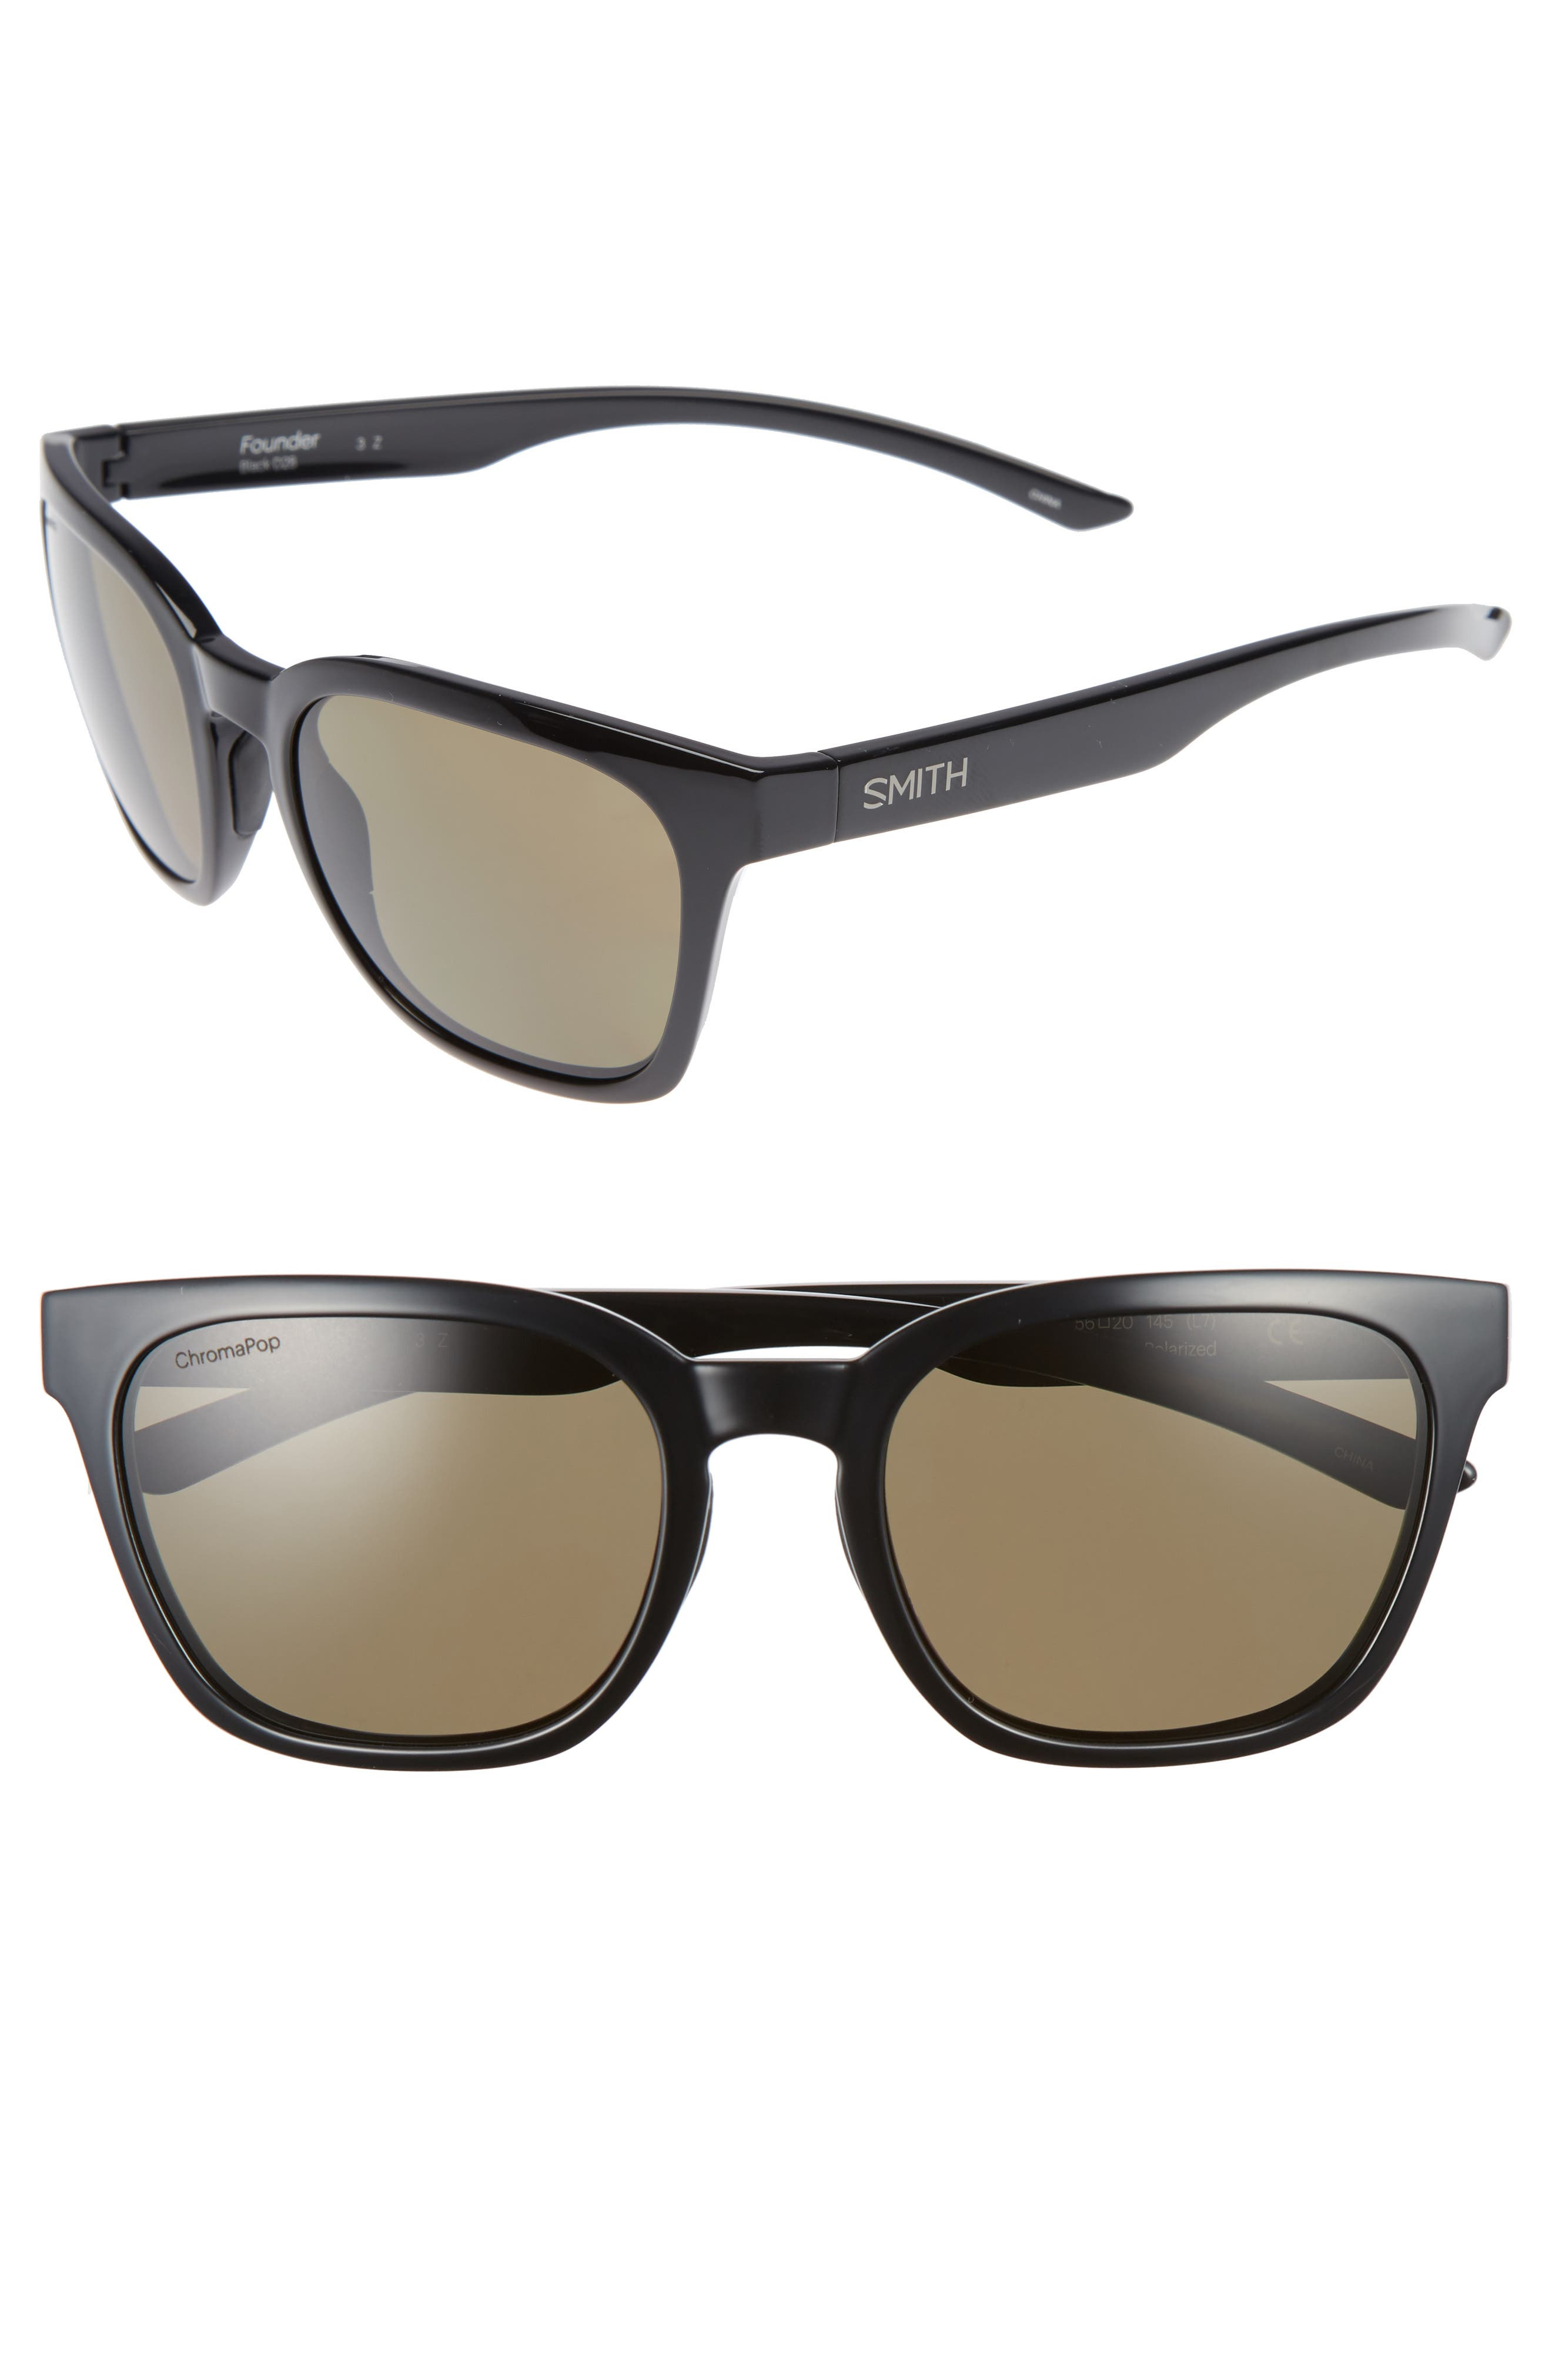 Founder 55mm ChromaPop<sup>™</sup> Polarized Sunglasses,                             Main thumbnail 1, color,                             001